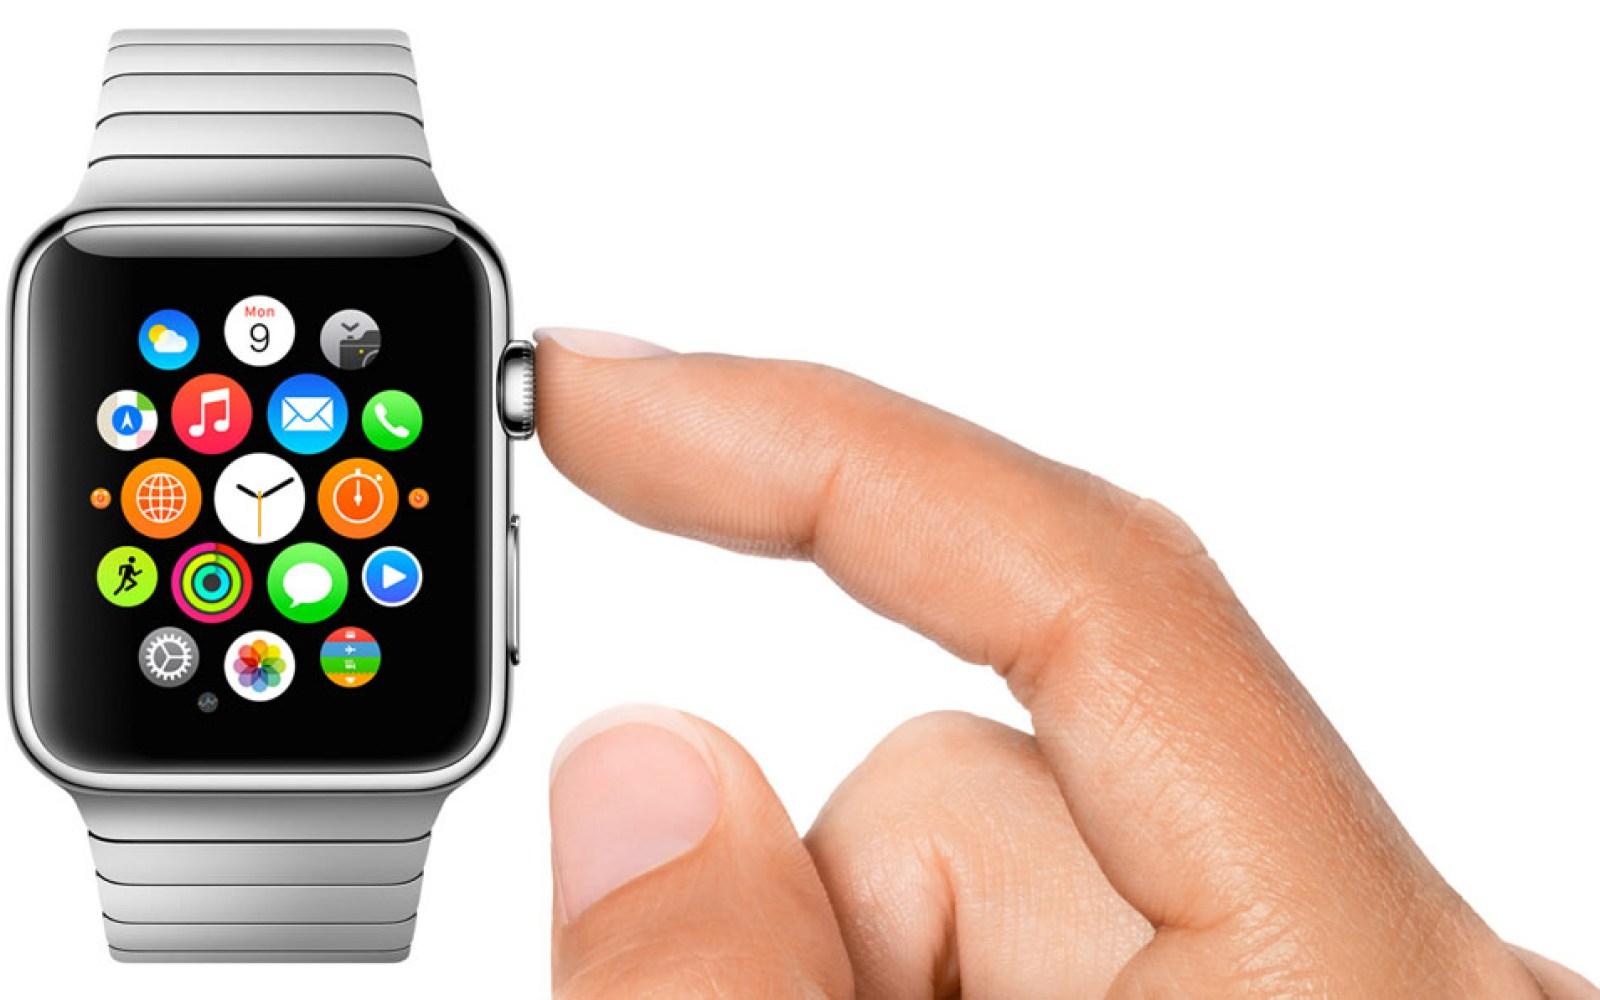 Yahoo & Localytics extend their analytics platforms to support Apple Watch apps